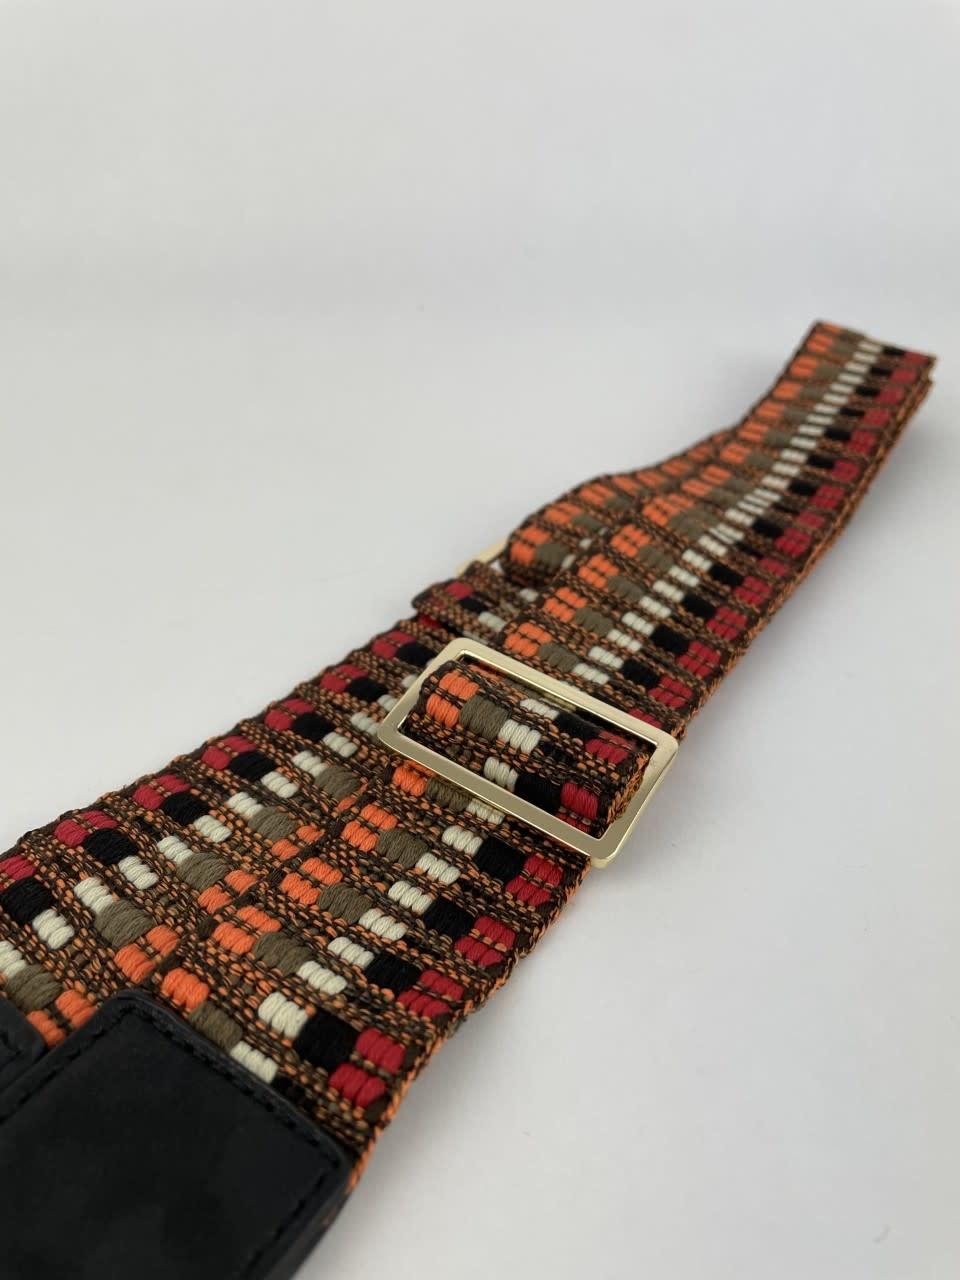 Ilmya woven shoulder strap Orange-2